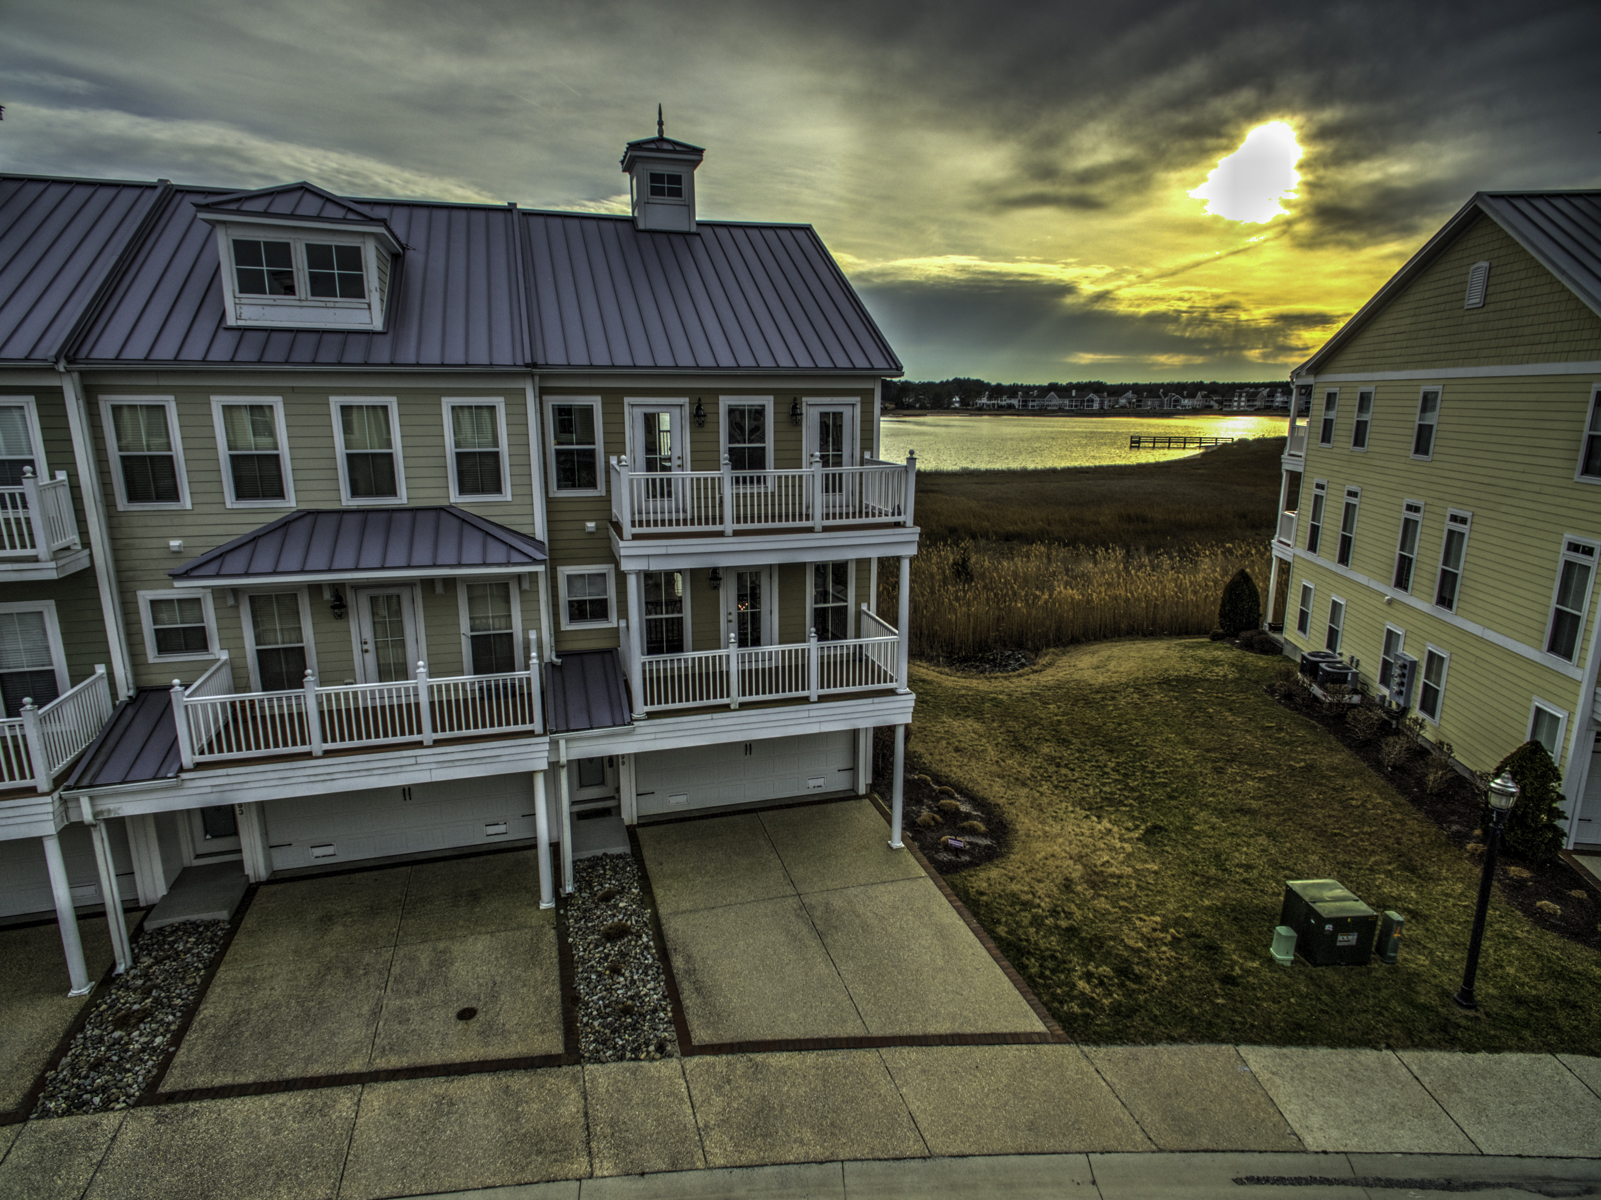 Condominium for Sale at 30199 Jump Lane , 507, Ocean View, DE 19970 30199 Jump Lane 507 Ocean View, Delaware 19970 United States